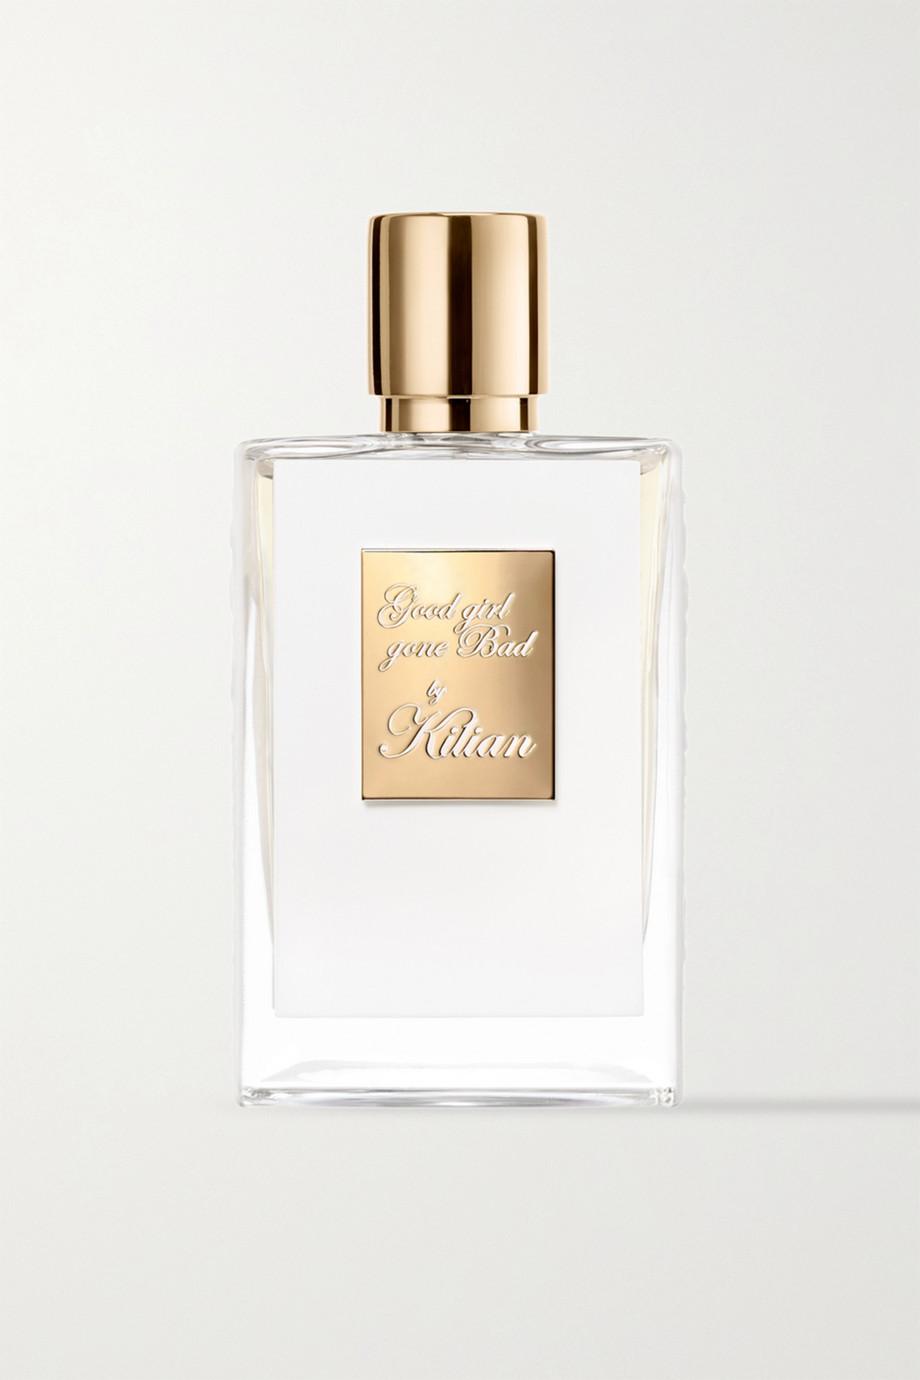 Kilian Good girl gone Bad – Rose, Tuberose & Jasmin, 50 ml – Eau de Parfum